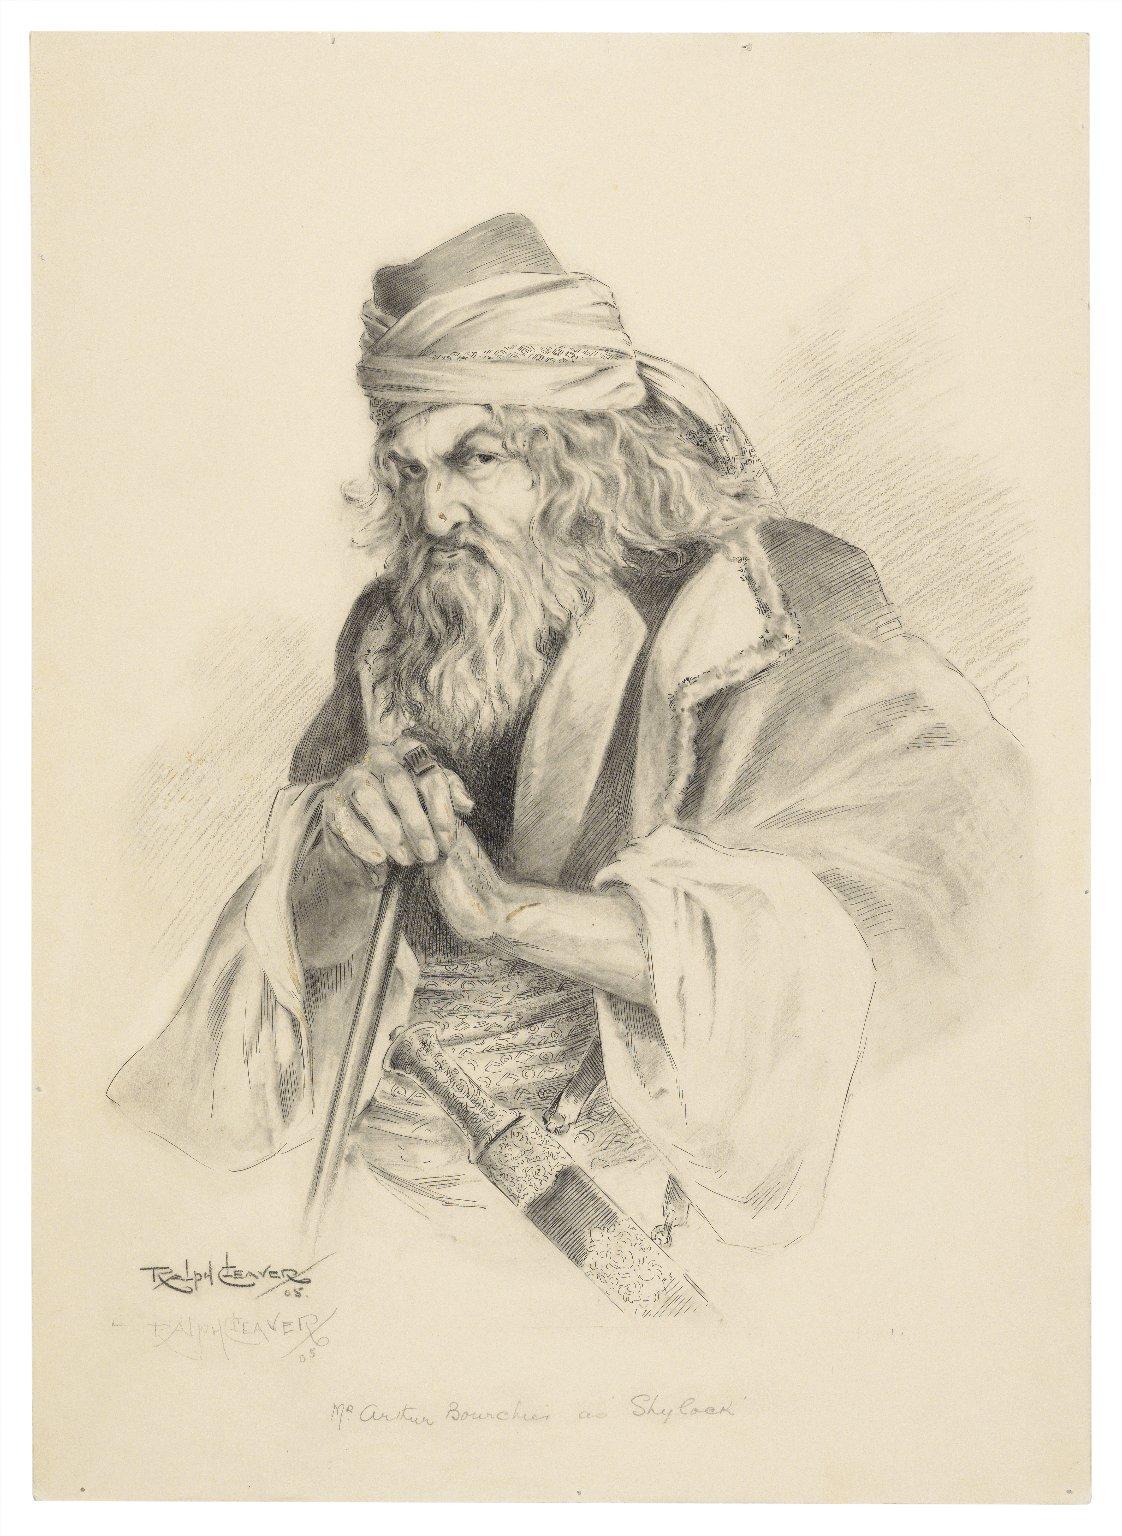 [Merchant of Venice] Mr. Arthur Bourchier as Shylock [at the Garrick] [graphic] / Ralph Cleaver.